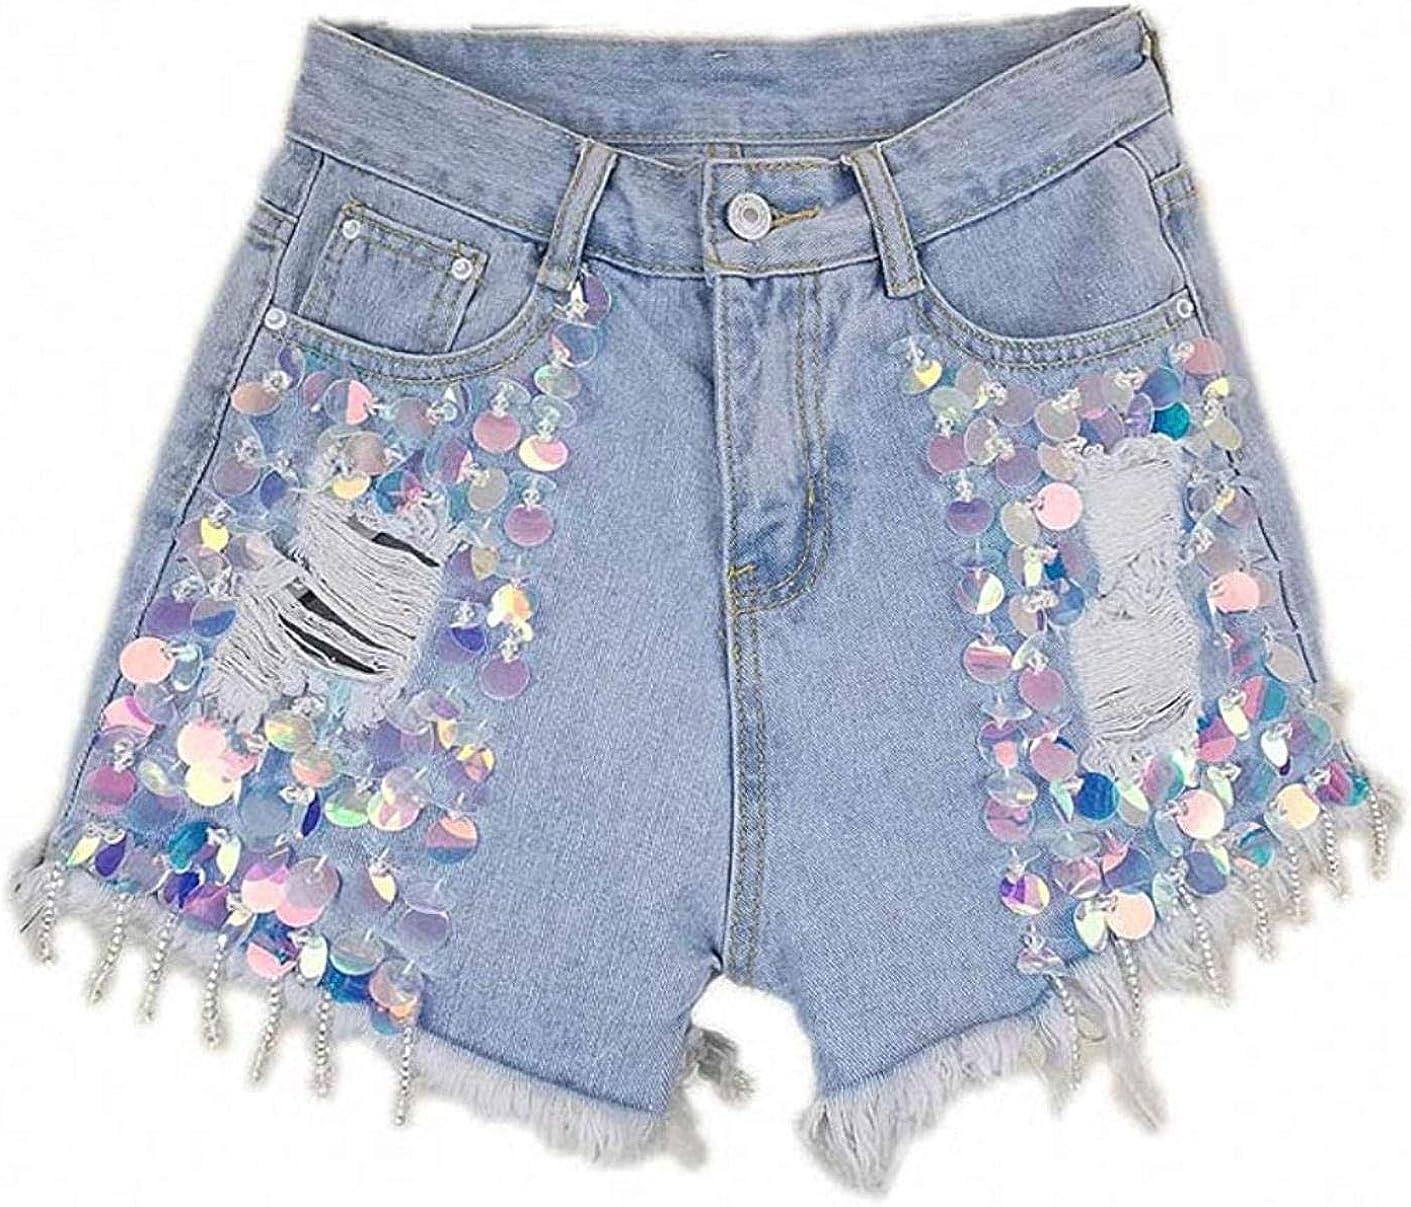 Tayaho Summer High Waist Loose Sequins Riped Black Denim Shorts Women